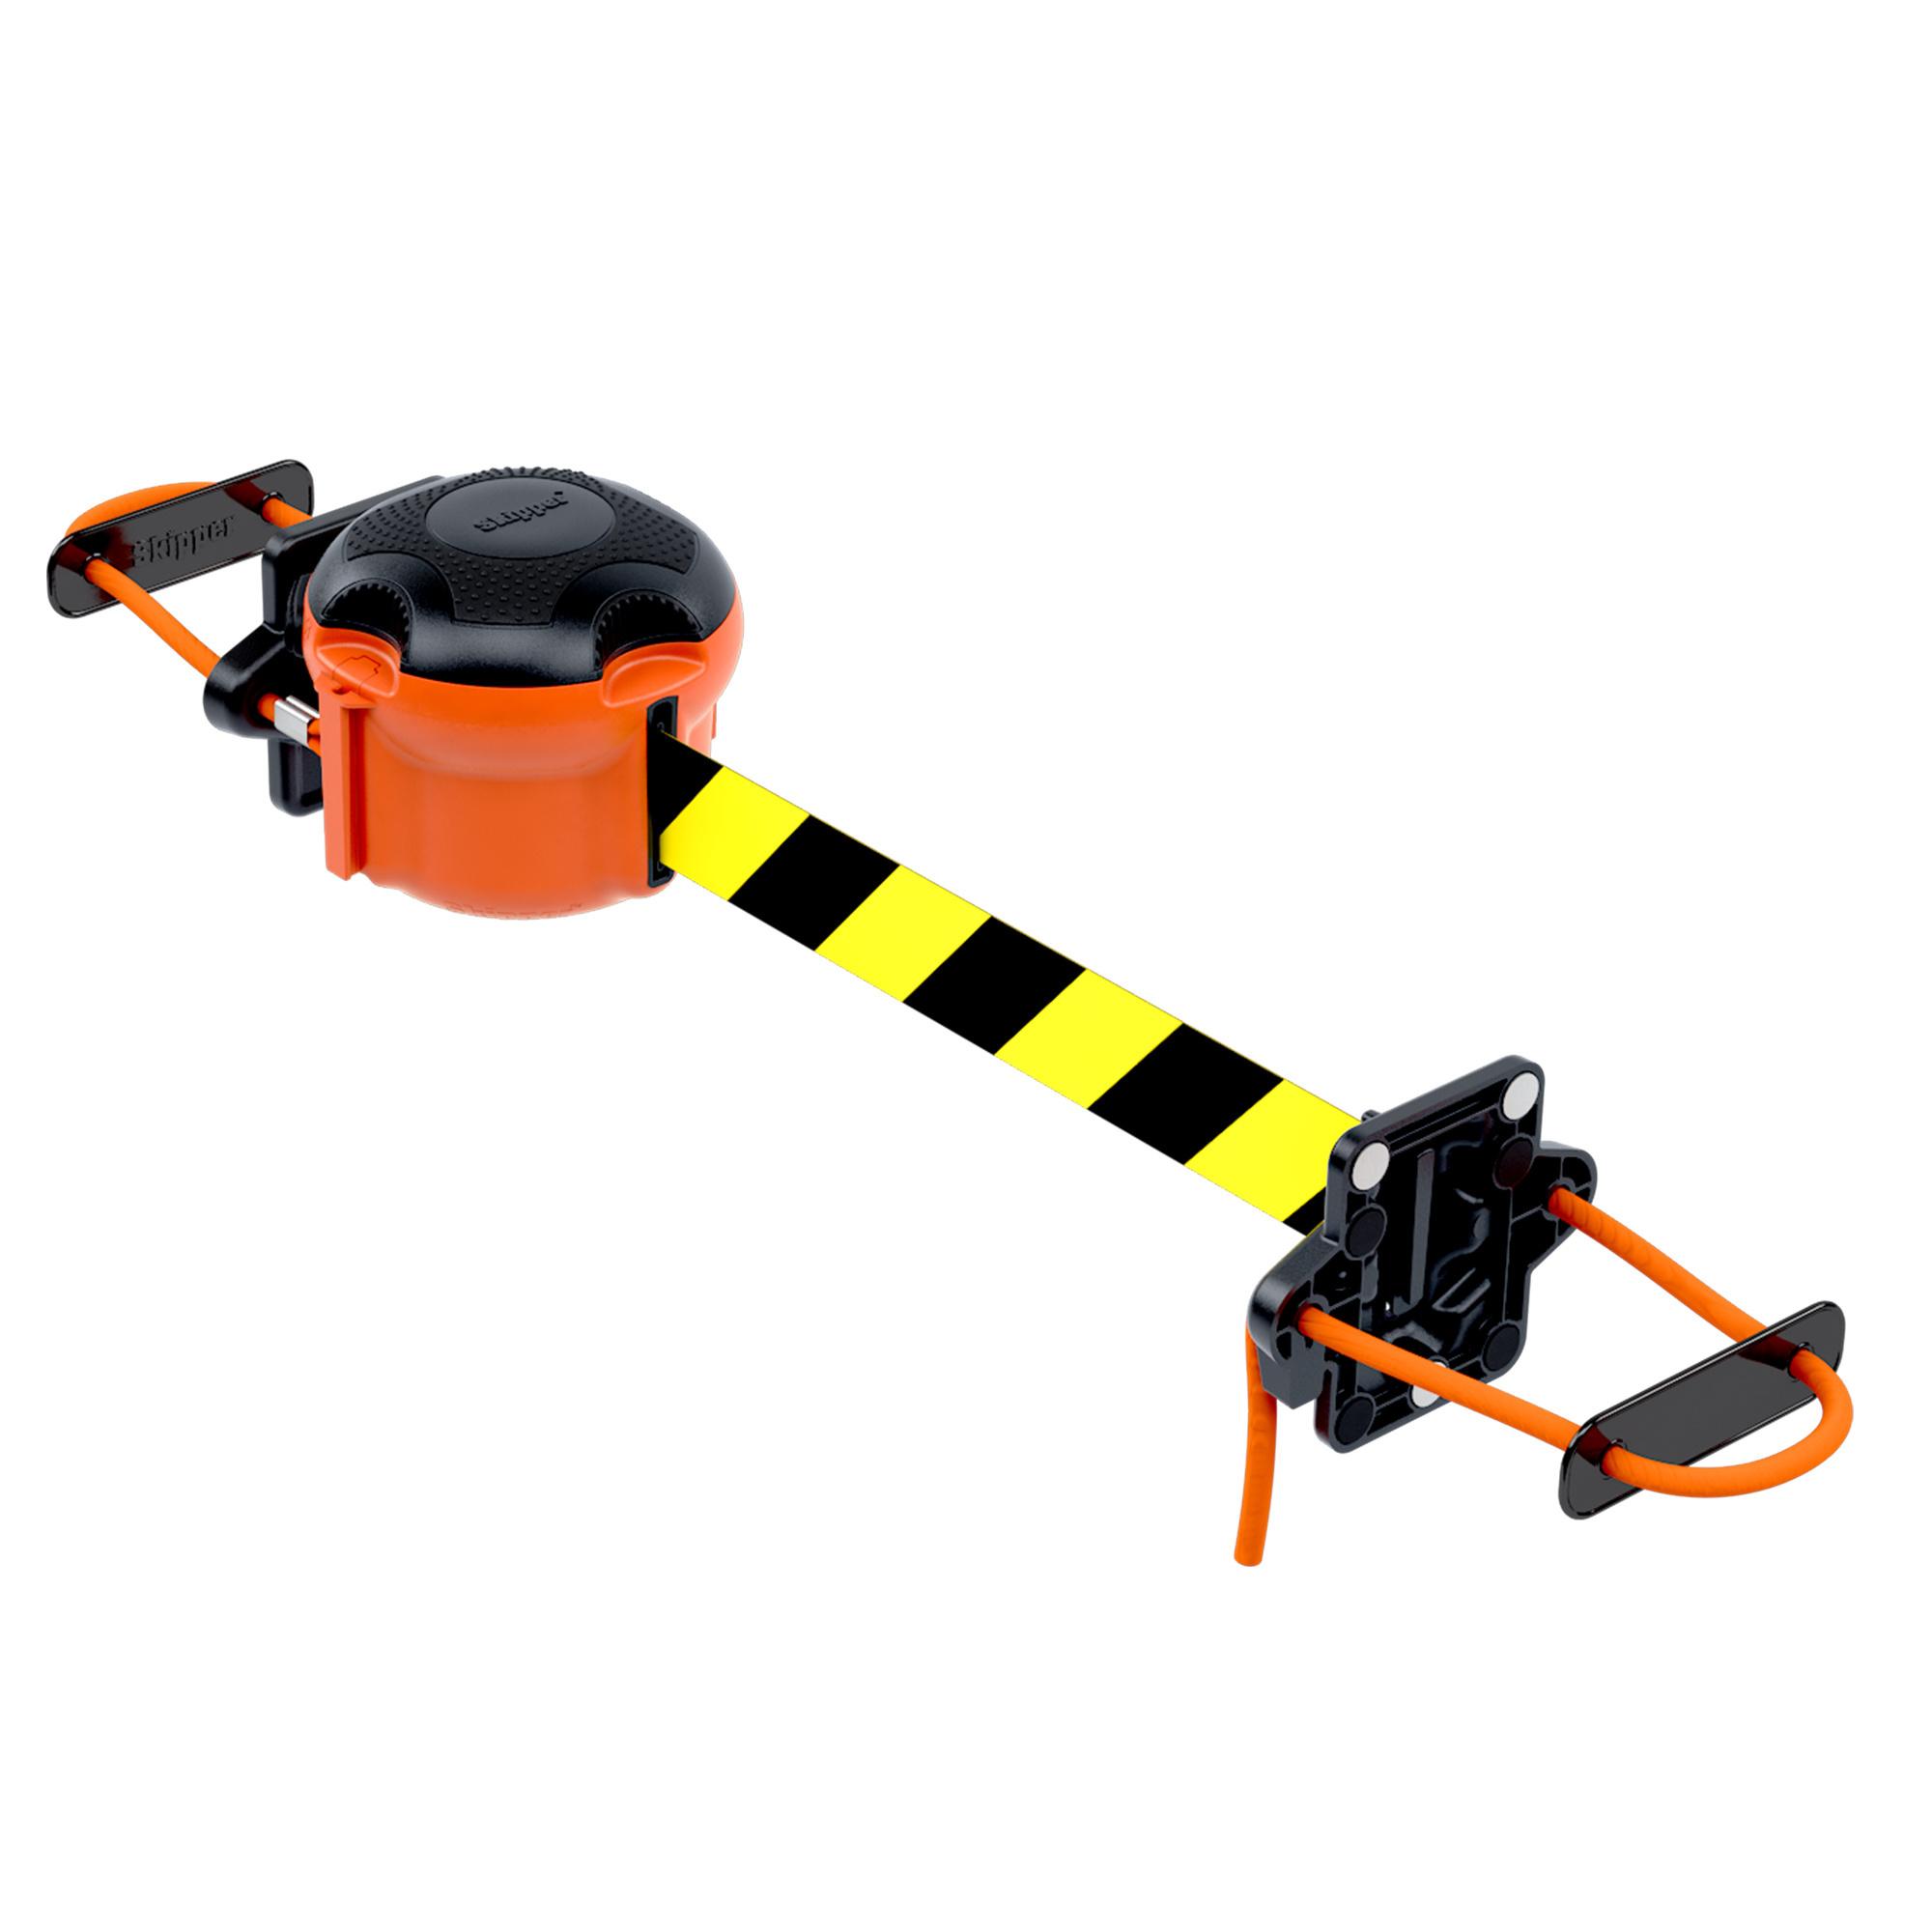 SKIPPER Skipper scaffolding kit - 9 meters safety barrier